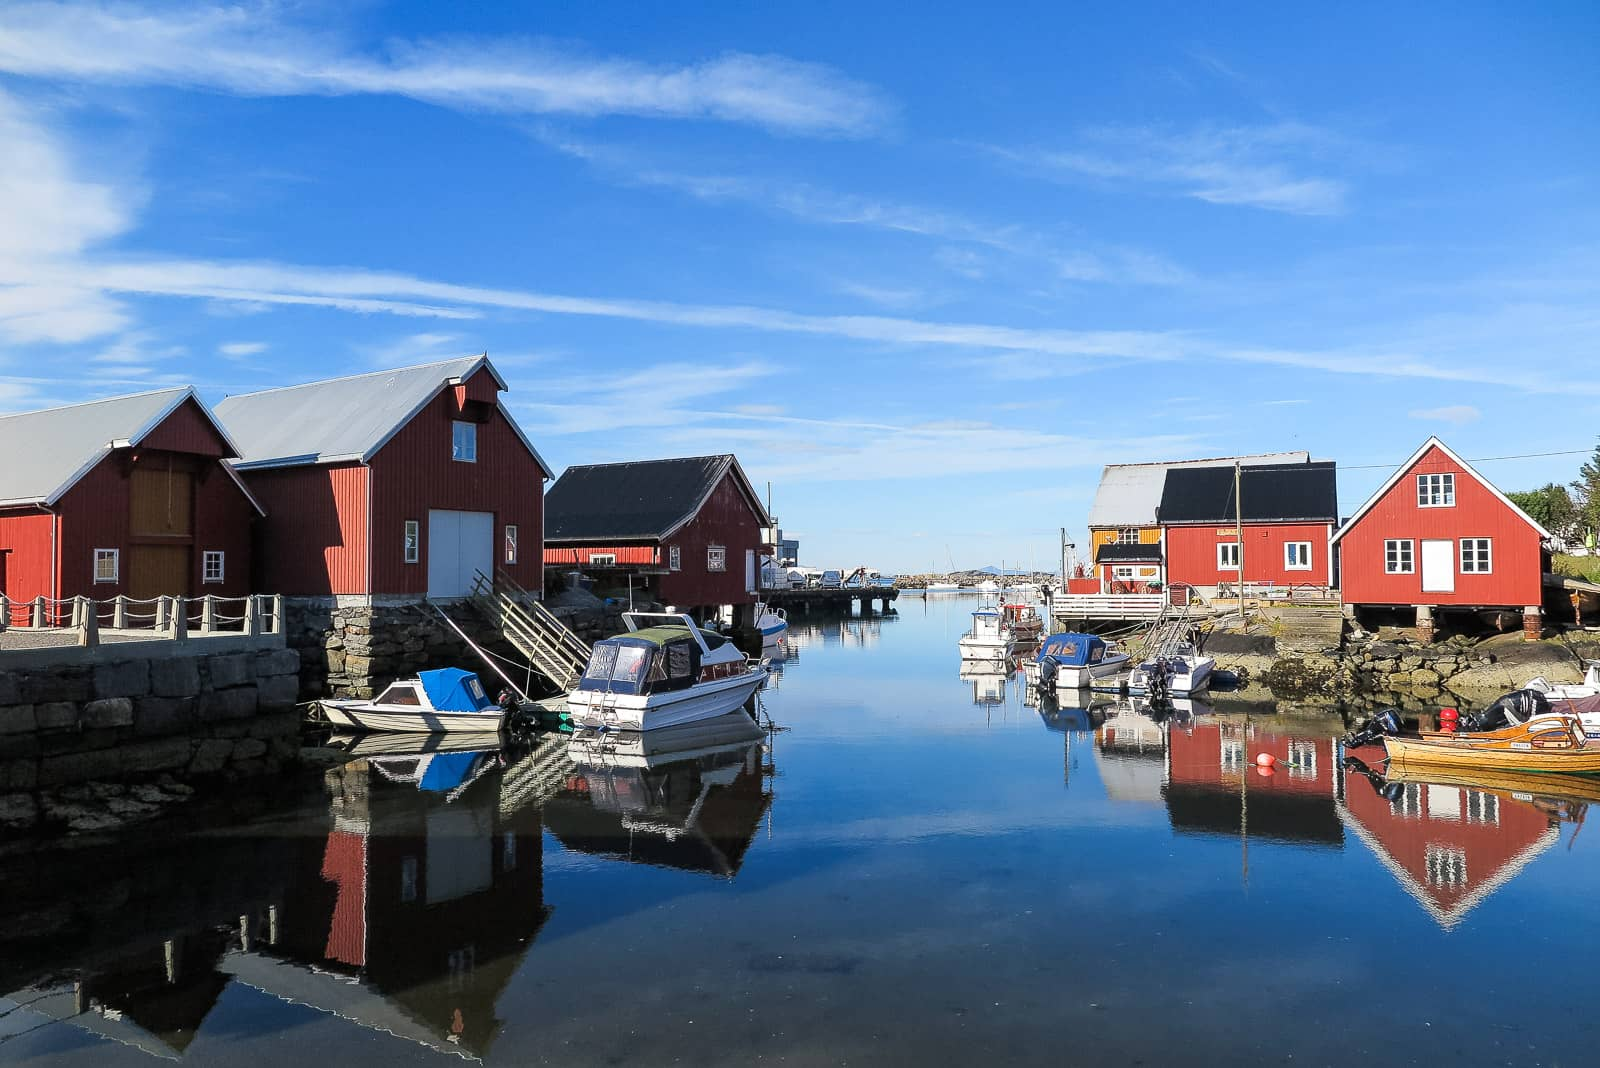 Unterwegs zur Atlantic Ocean Road: Norwegen ist vor allem etwas fürs Auge